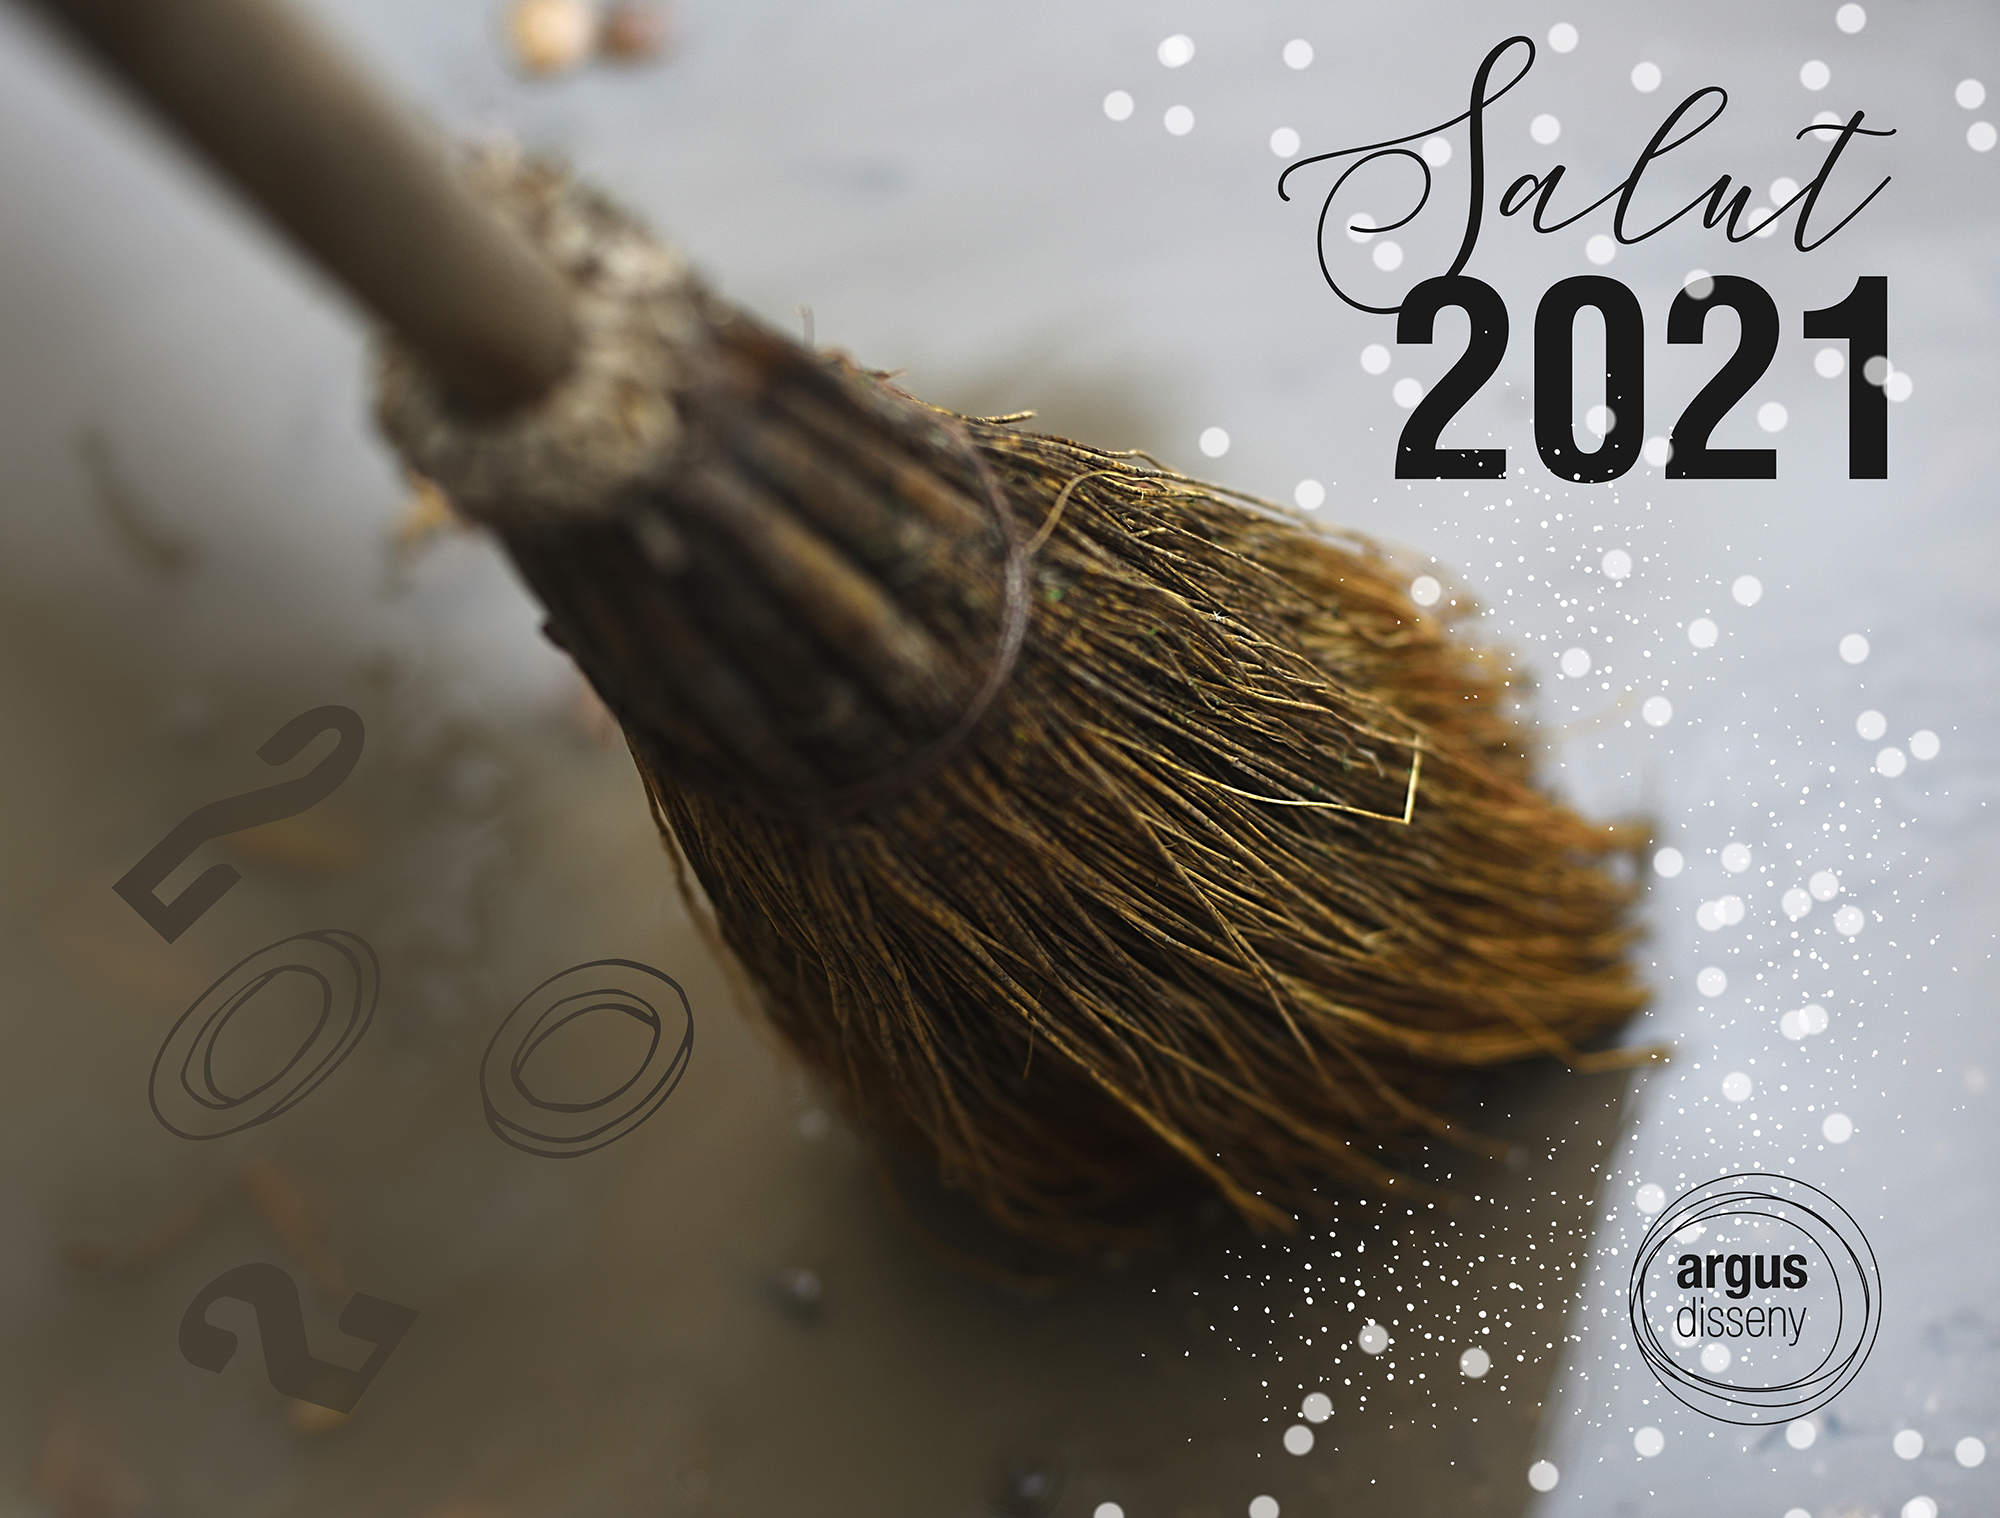 Salut 2021